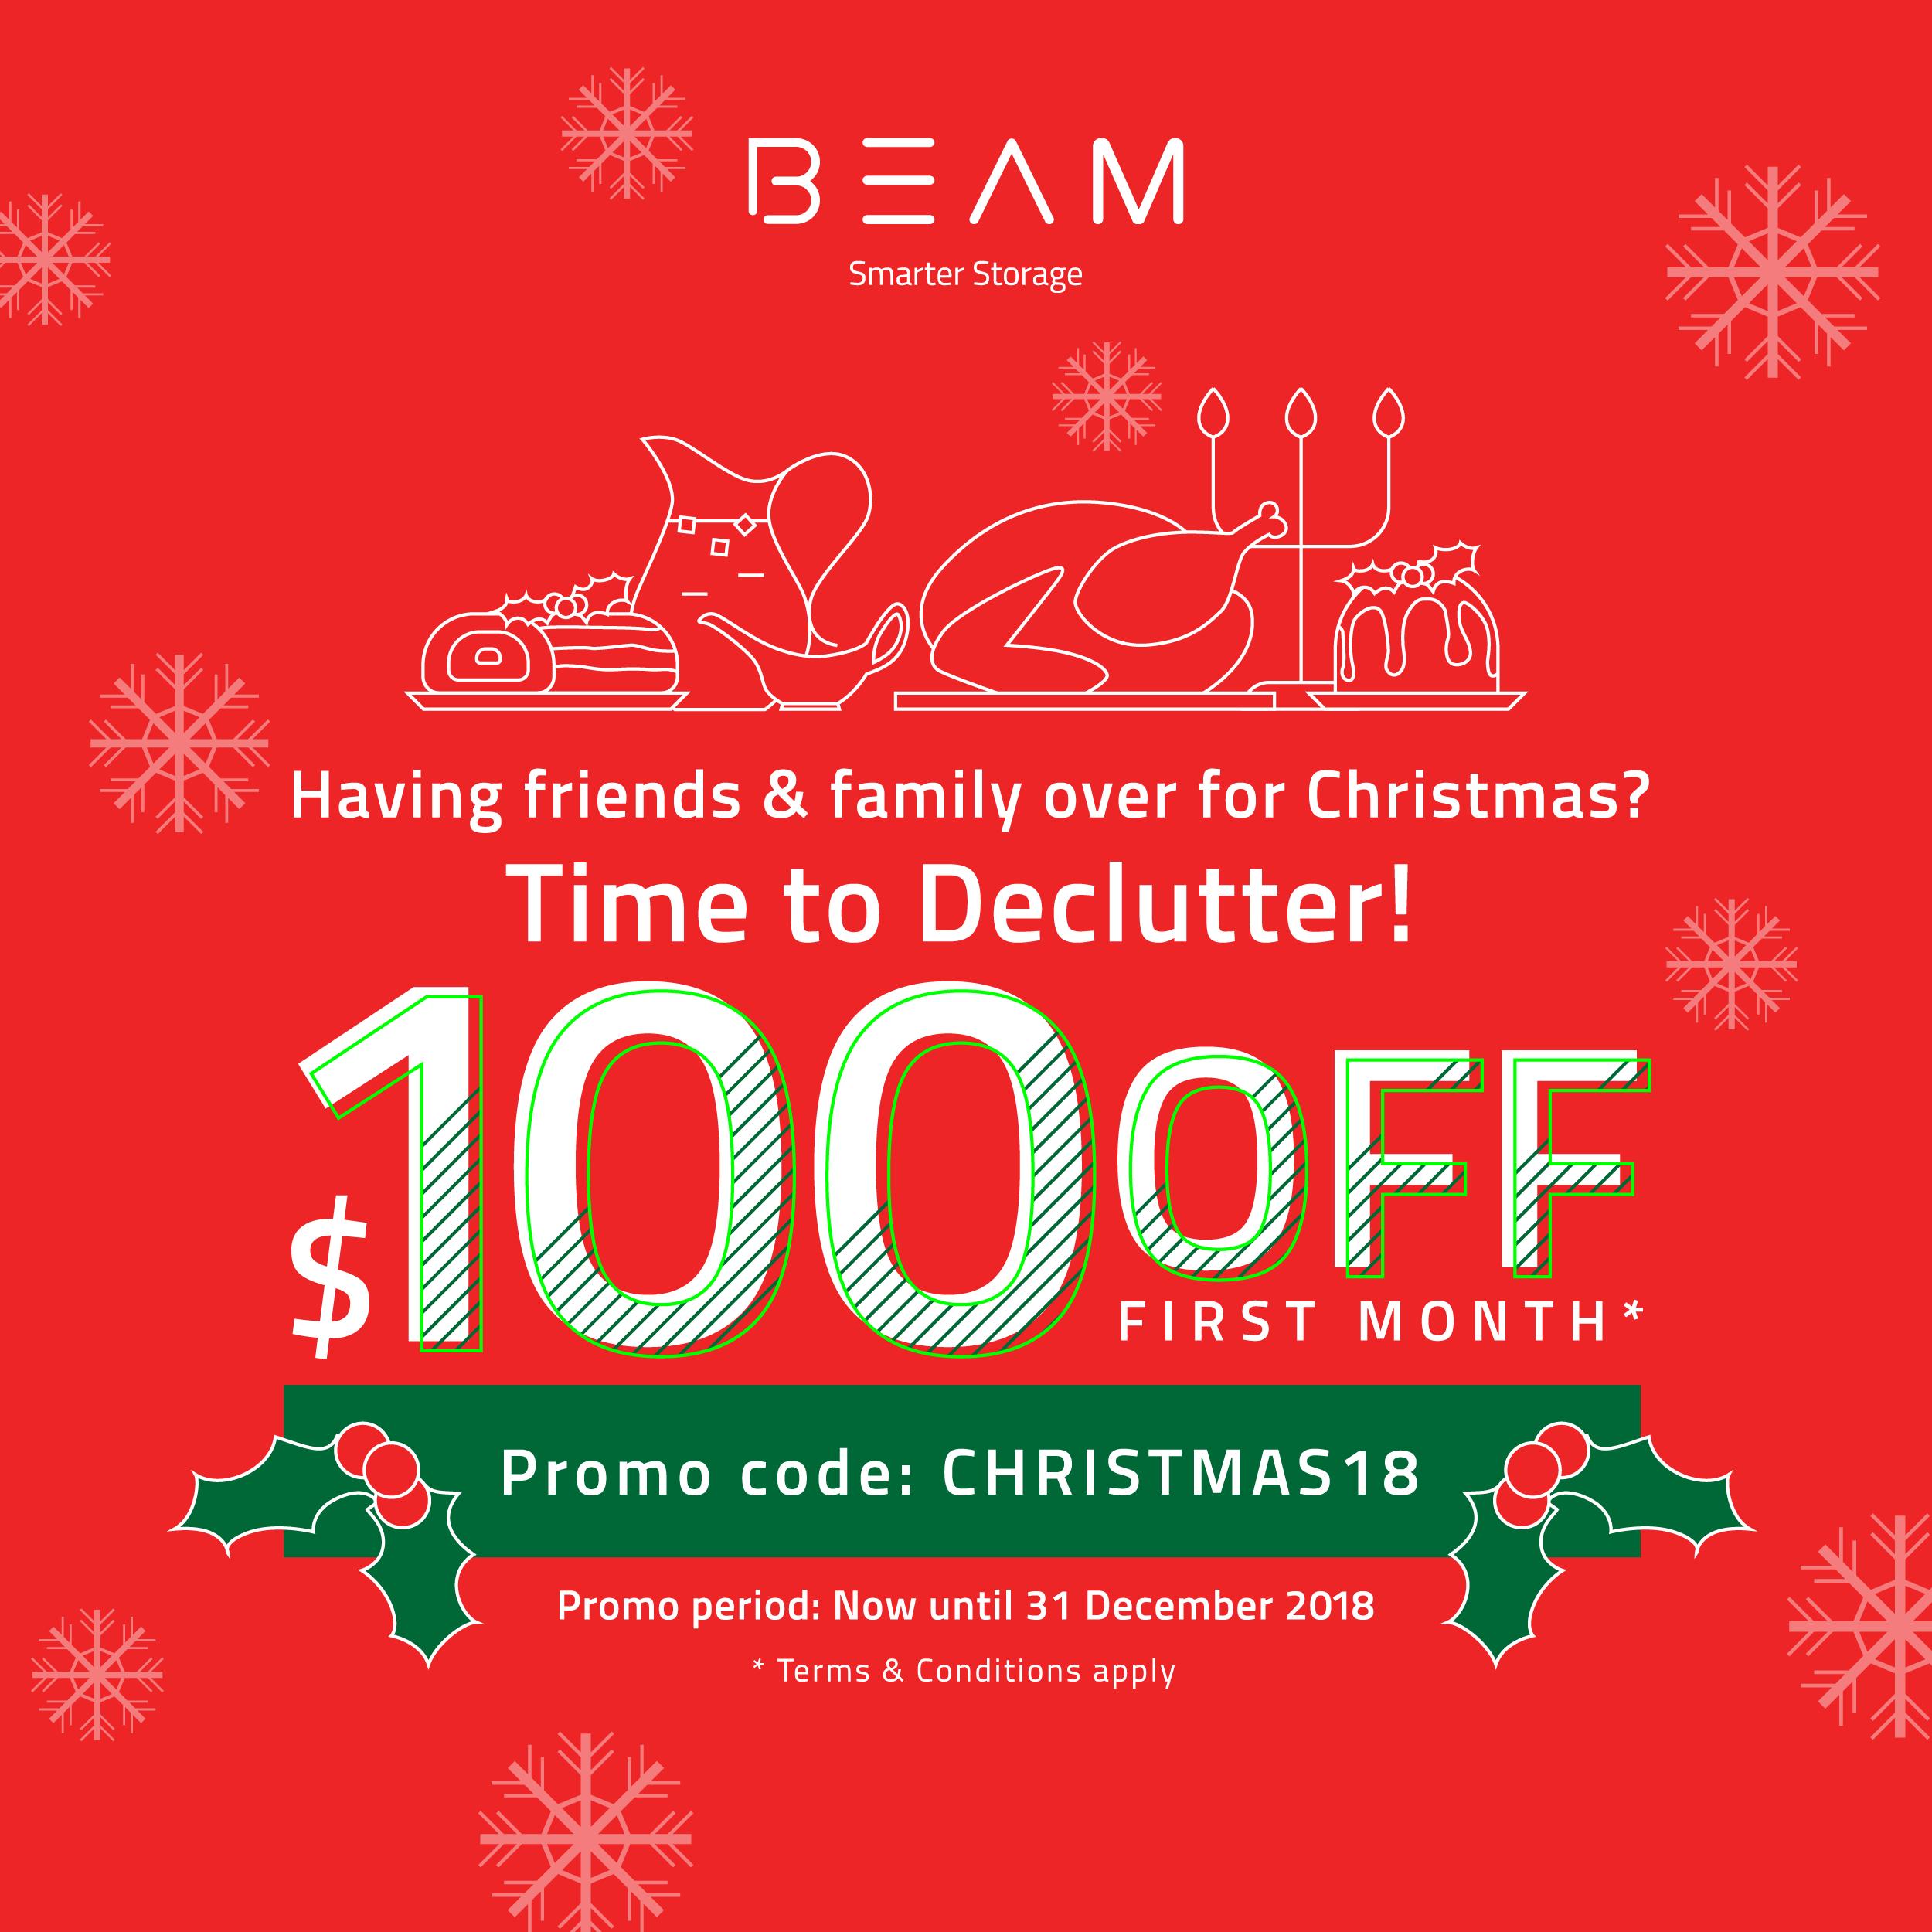 BEAM Storage Christmas 2018 Promotion